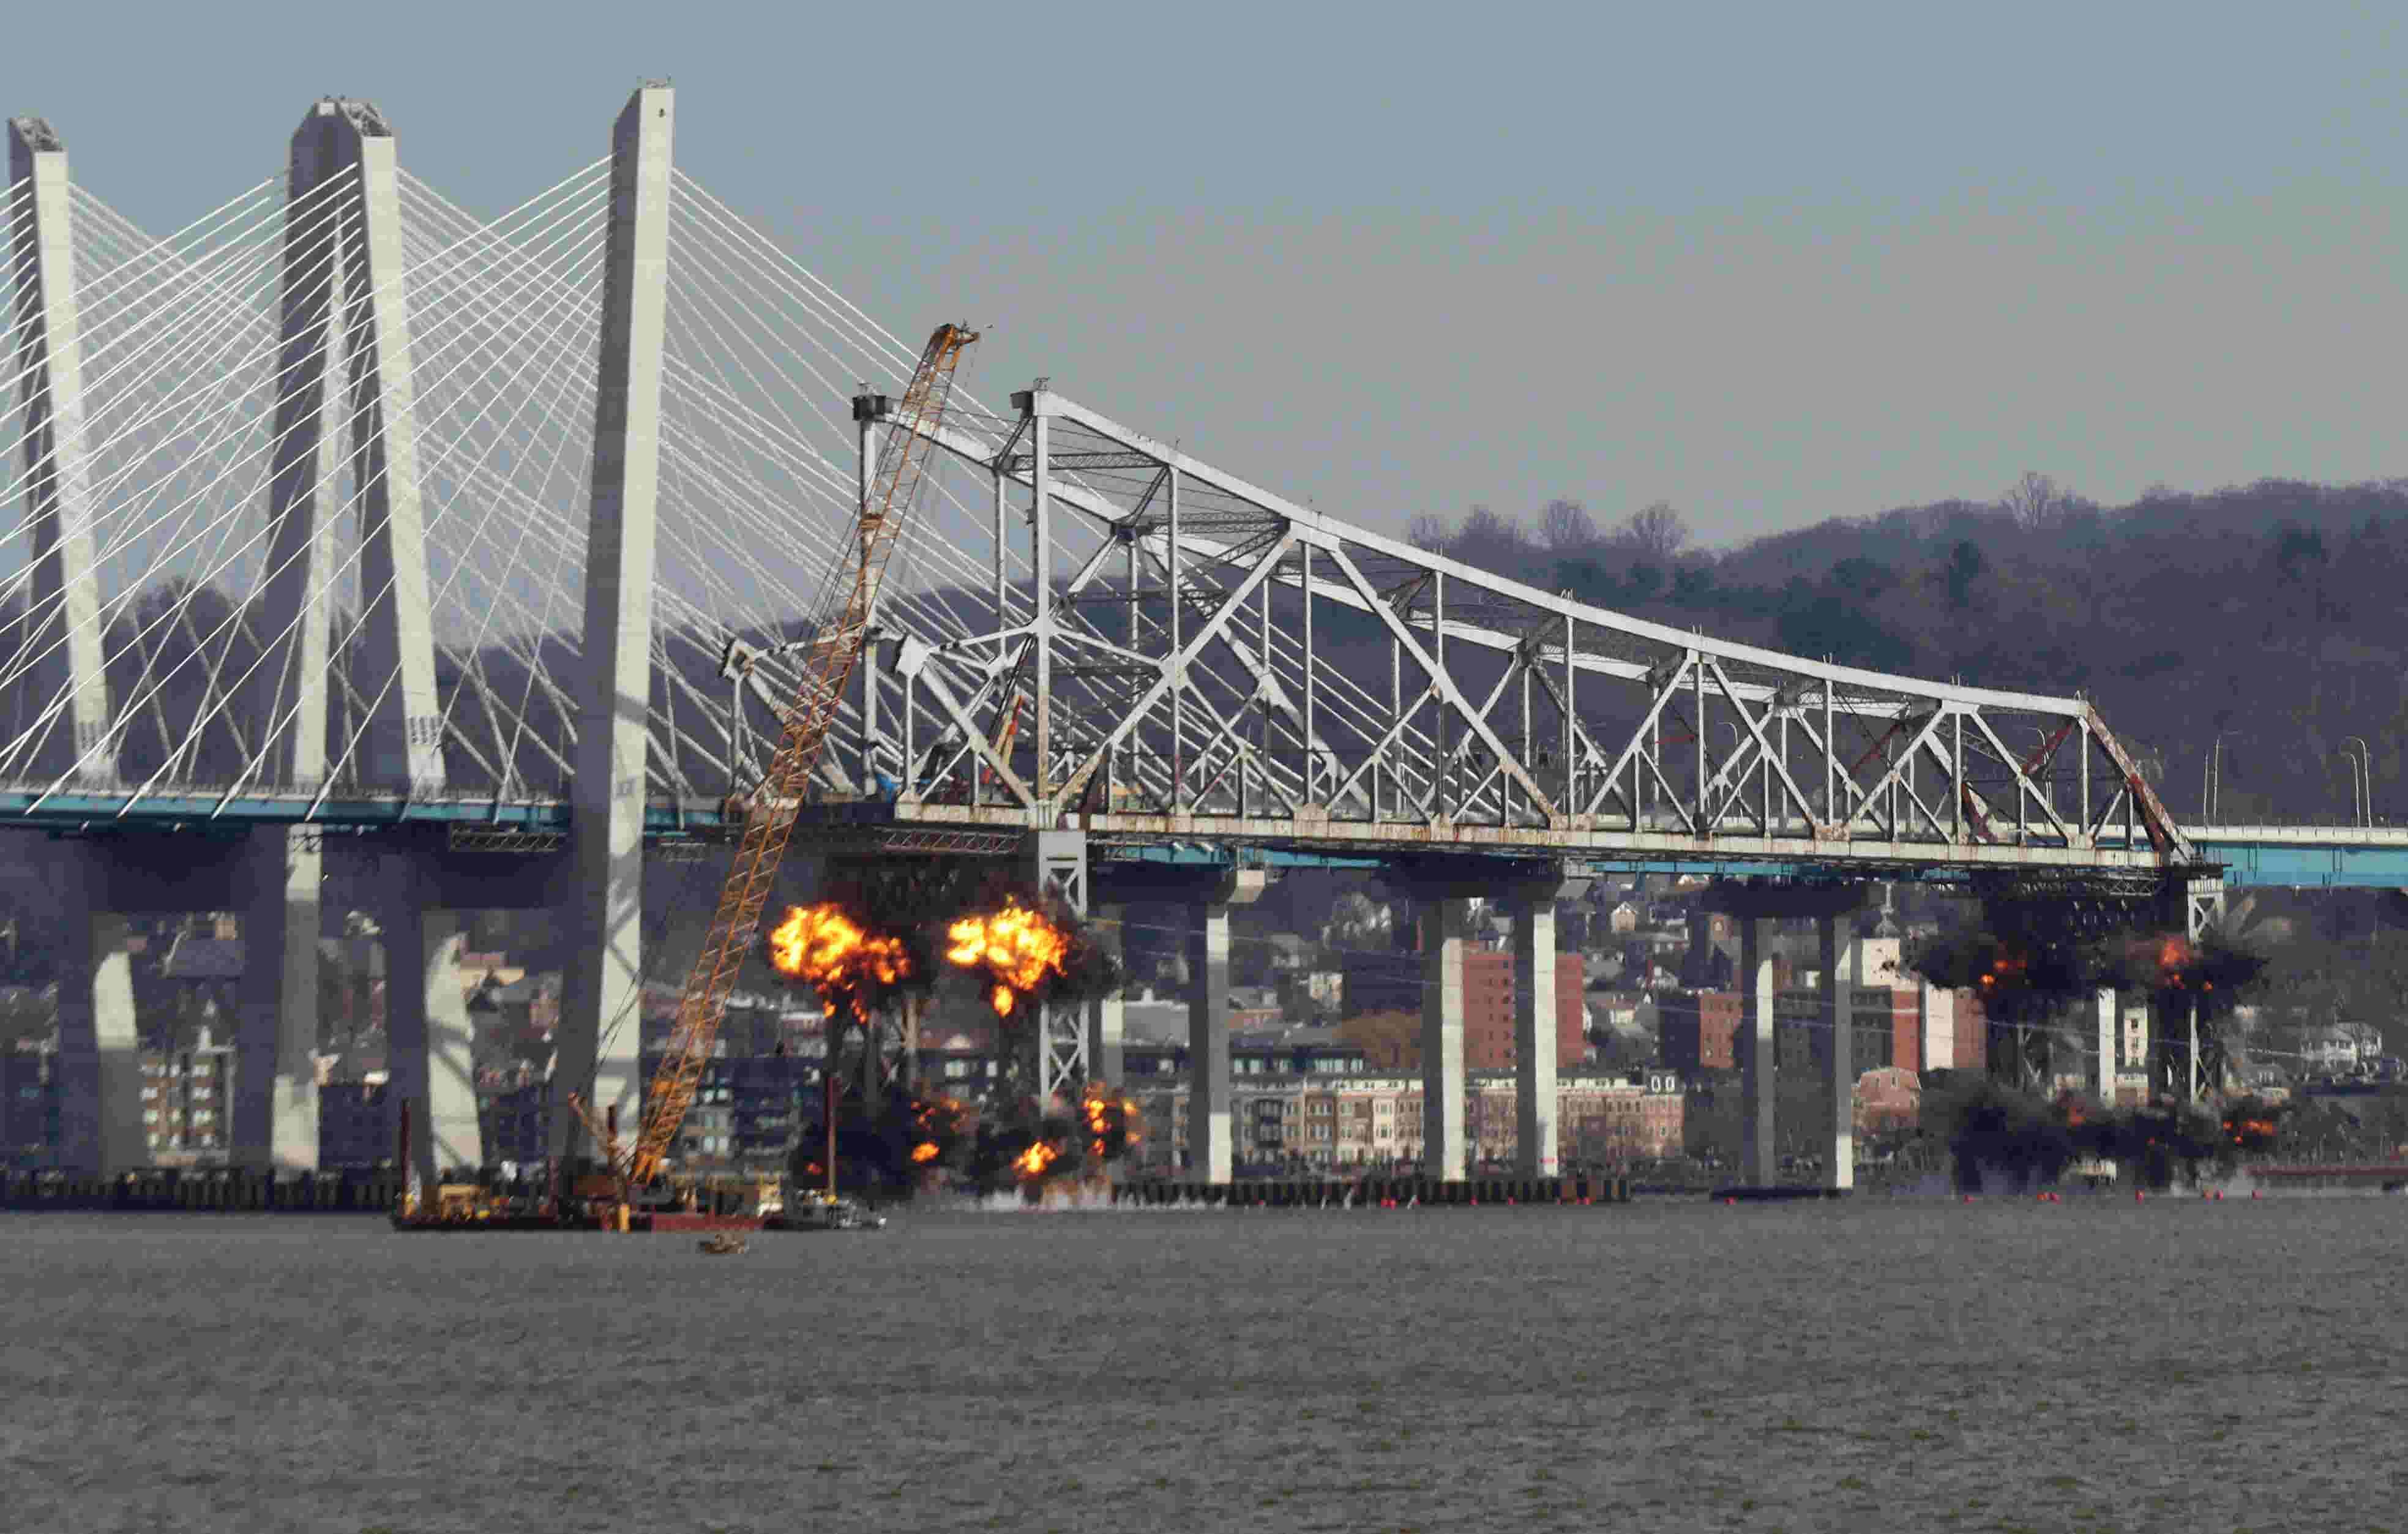 Video: Tappan Zee Bridge demolition